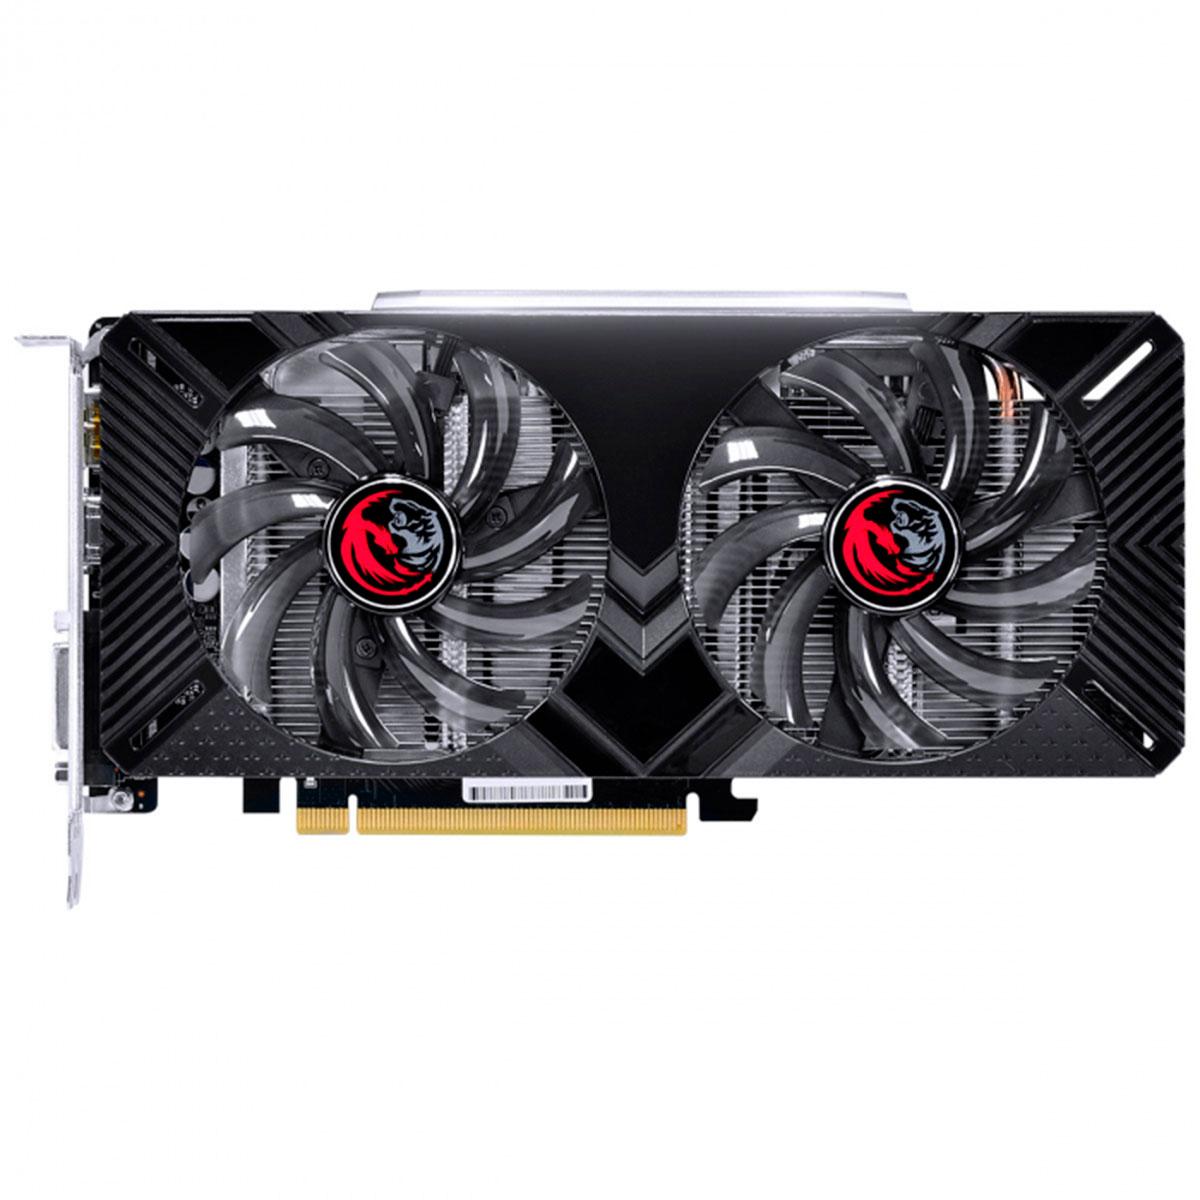 Placa de Vídeo PCYes GeForce RTX 2060 Dual OC 6GB, GDDR6, 192 Bits, Graffiti Series - PPGF2060DR6192